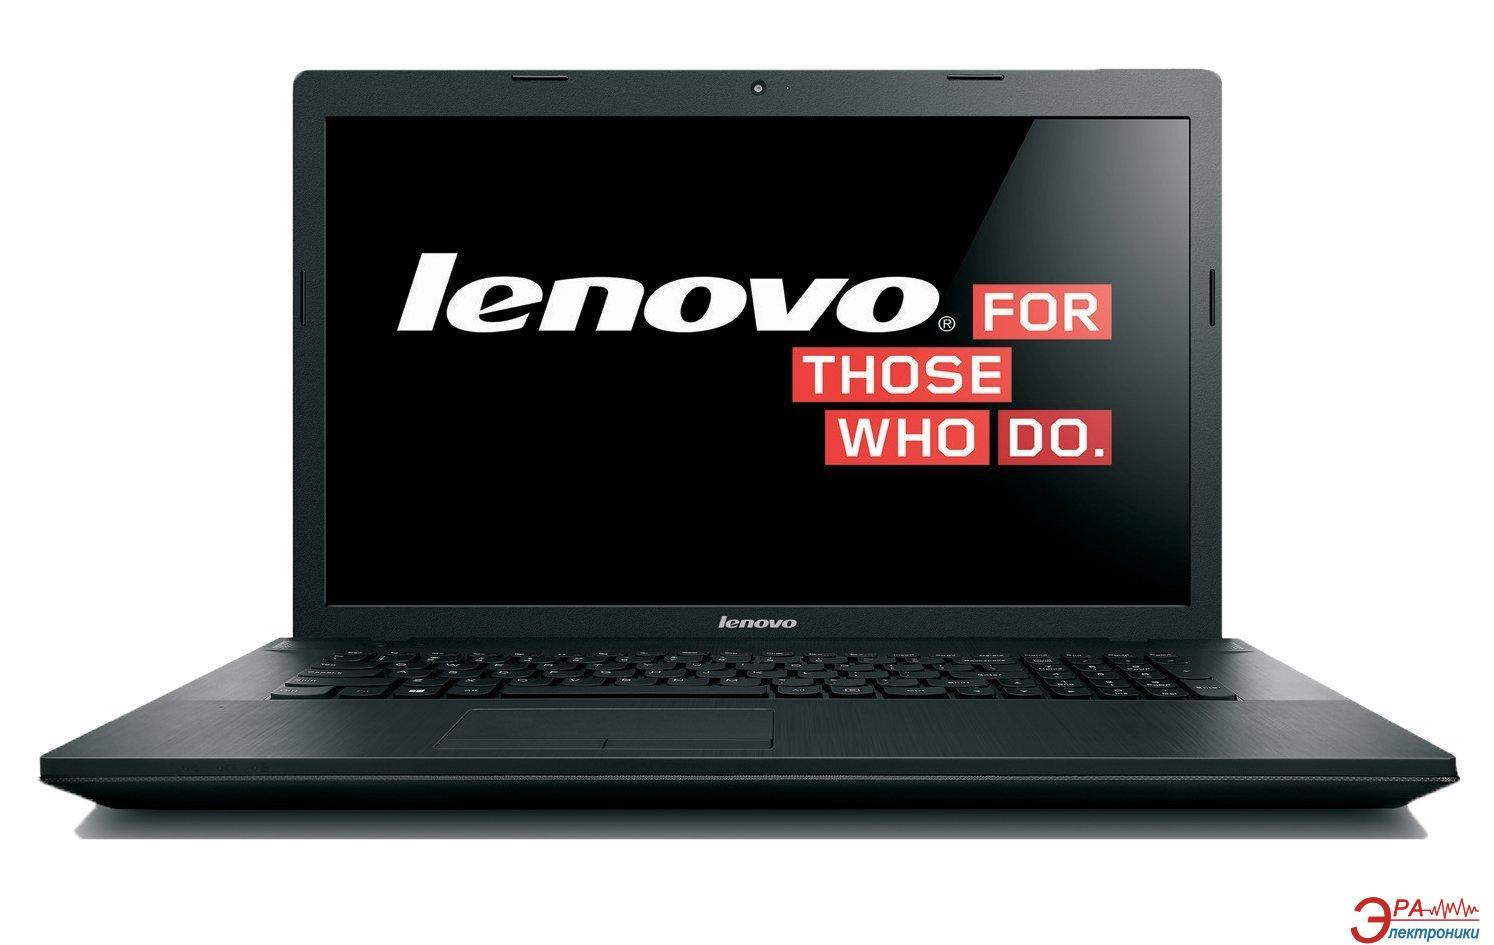 Ноутбук Lenovo IdeaPad G710 (59-410793) Black 17,3